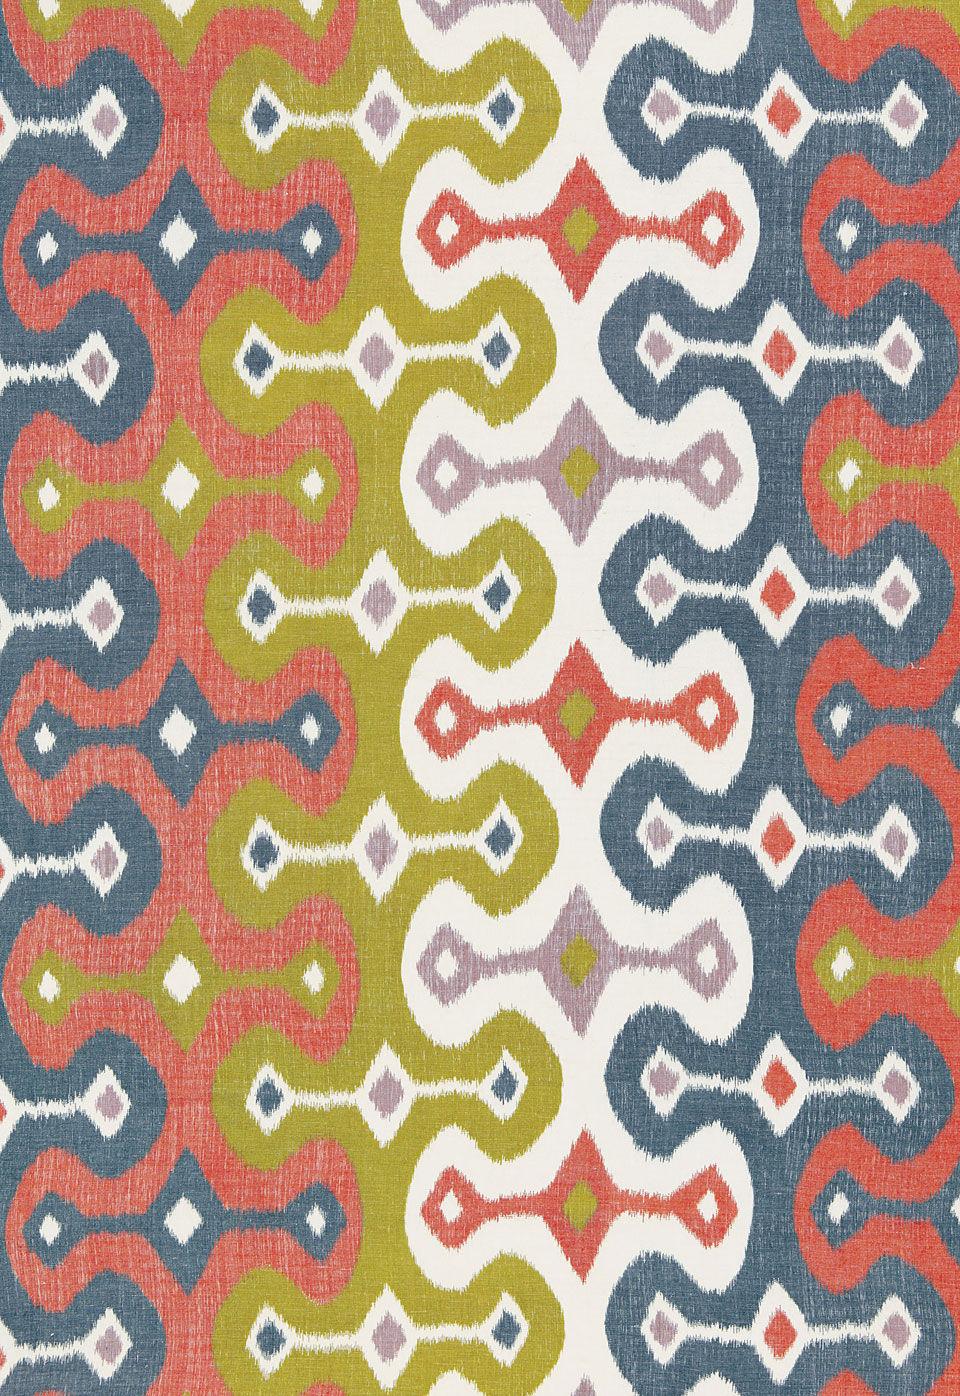 upholstery fabric patterned linen hand printed darya ikat